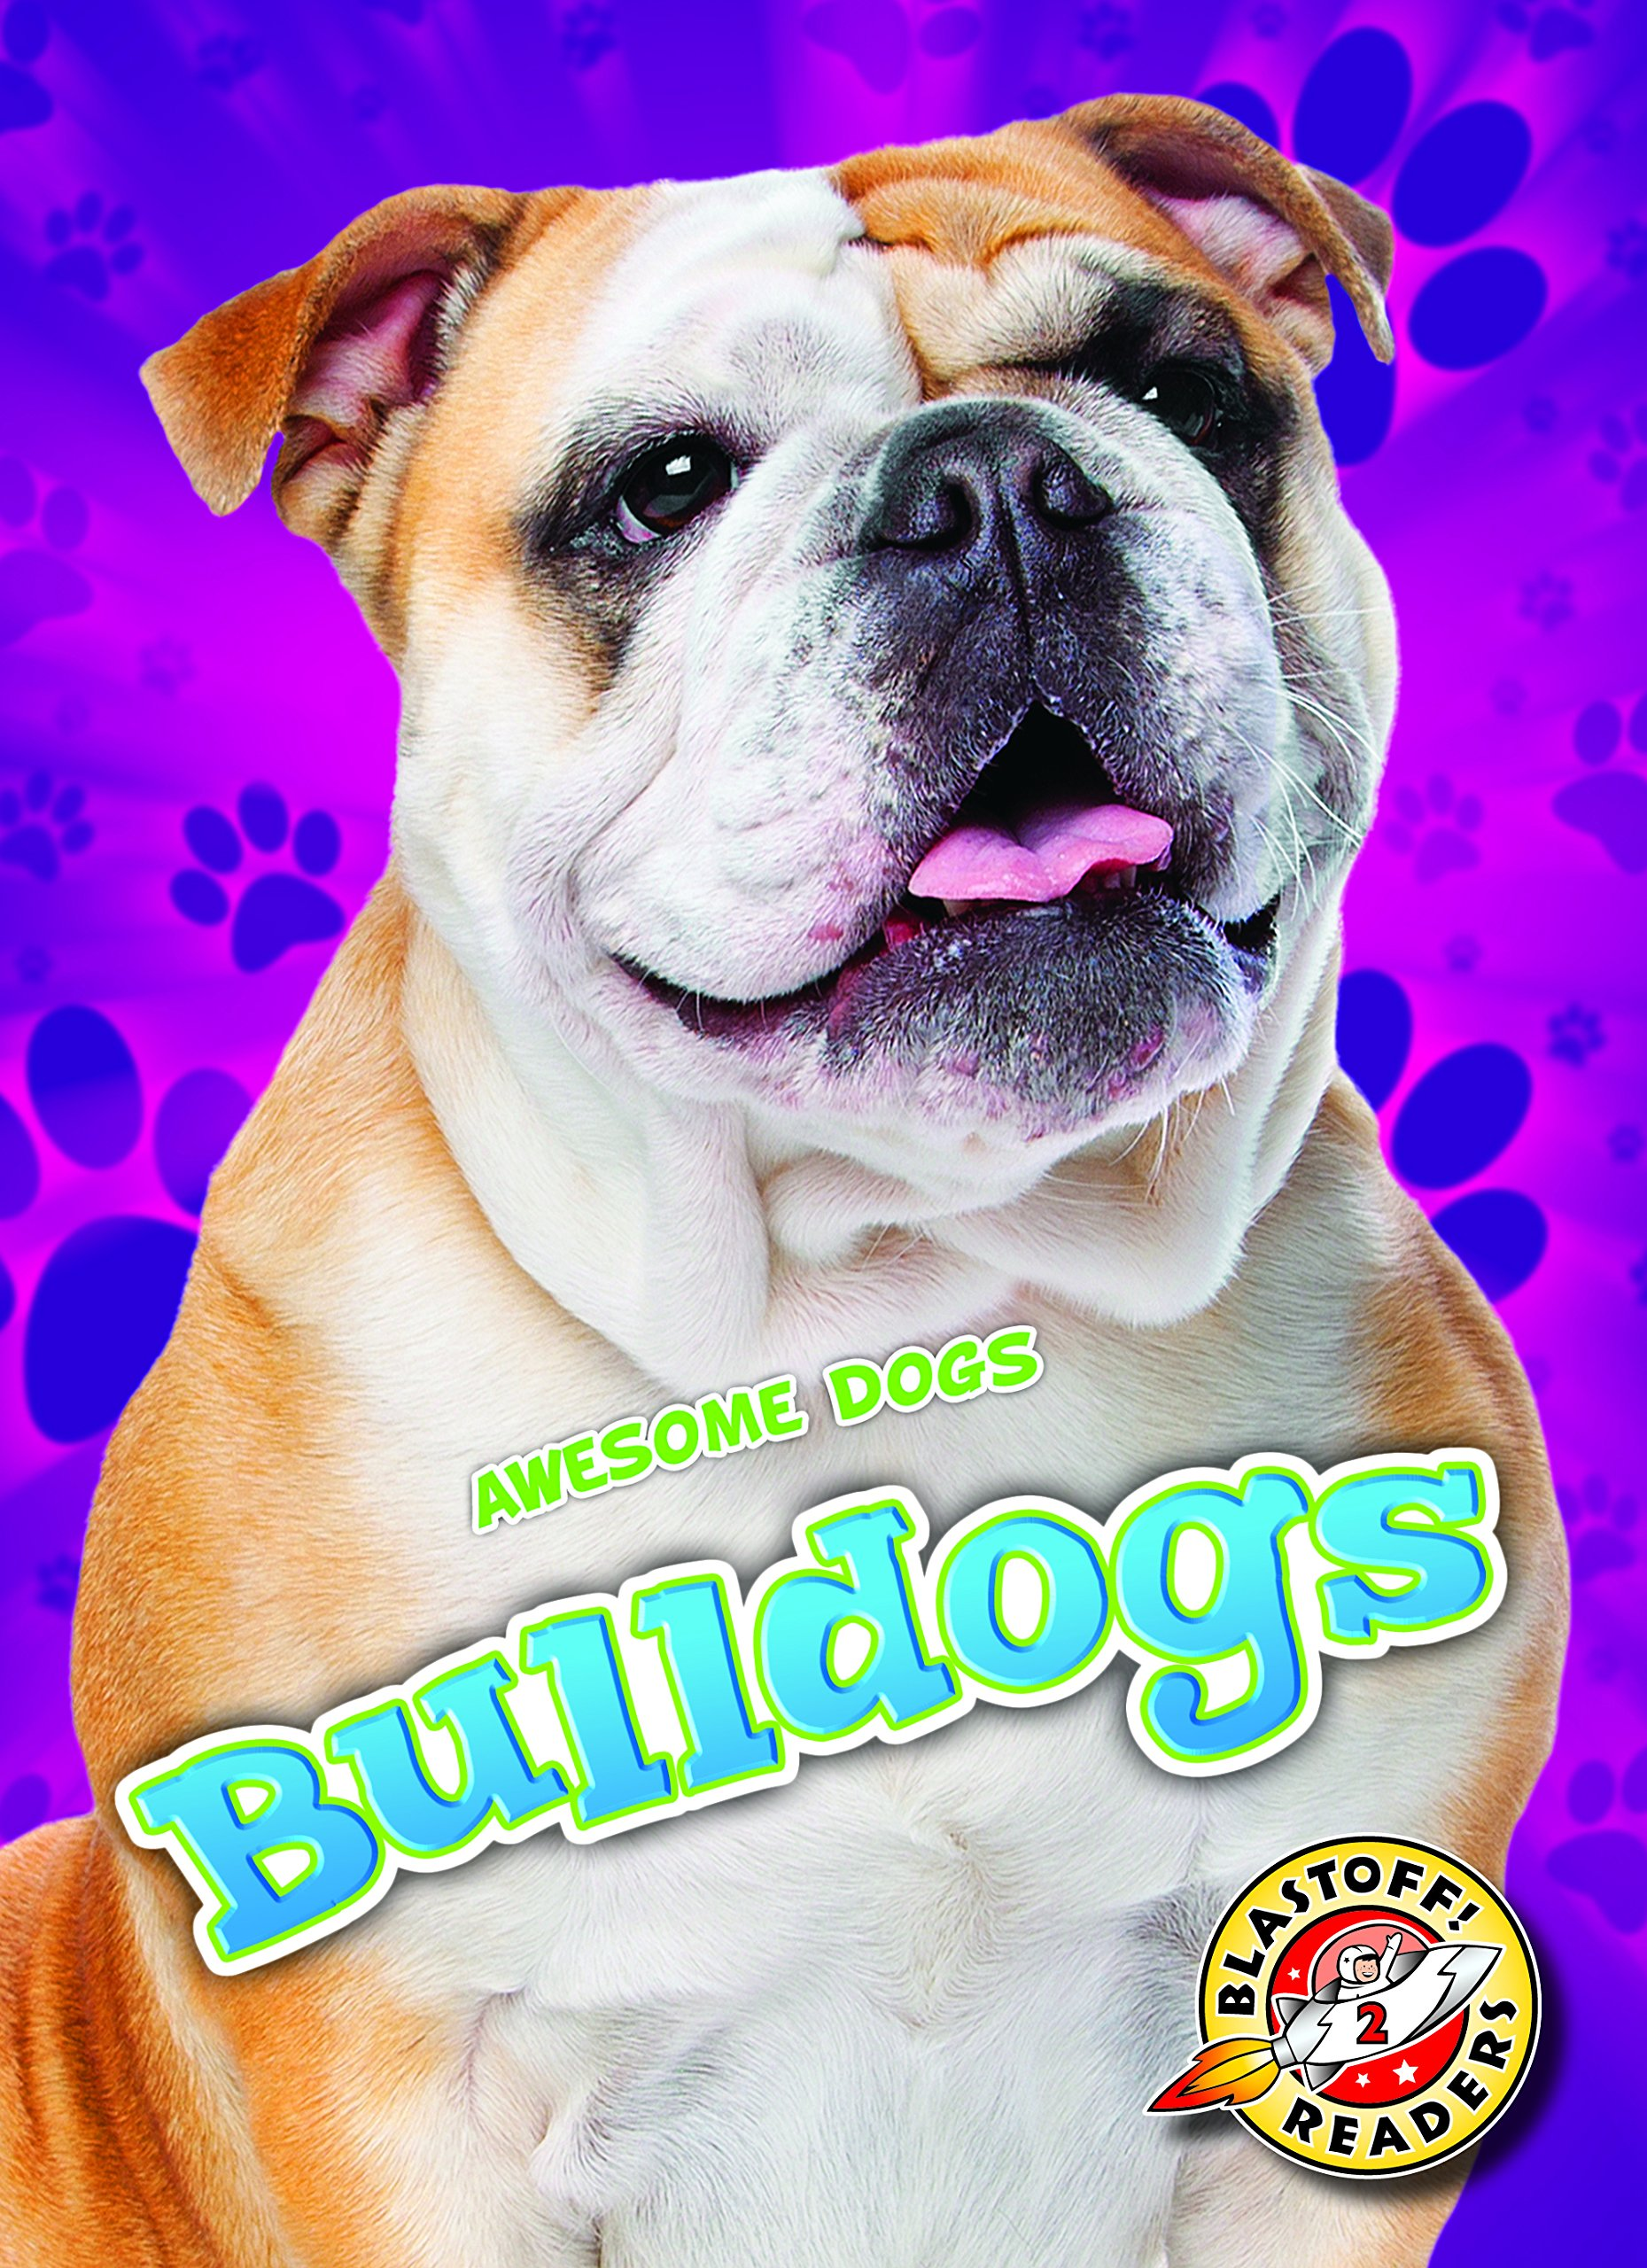 Download Bulldogs (Blastoff Readers. Level 2) PDF